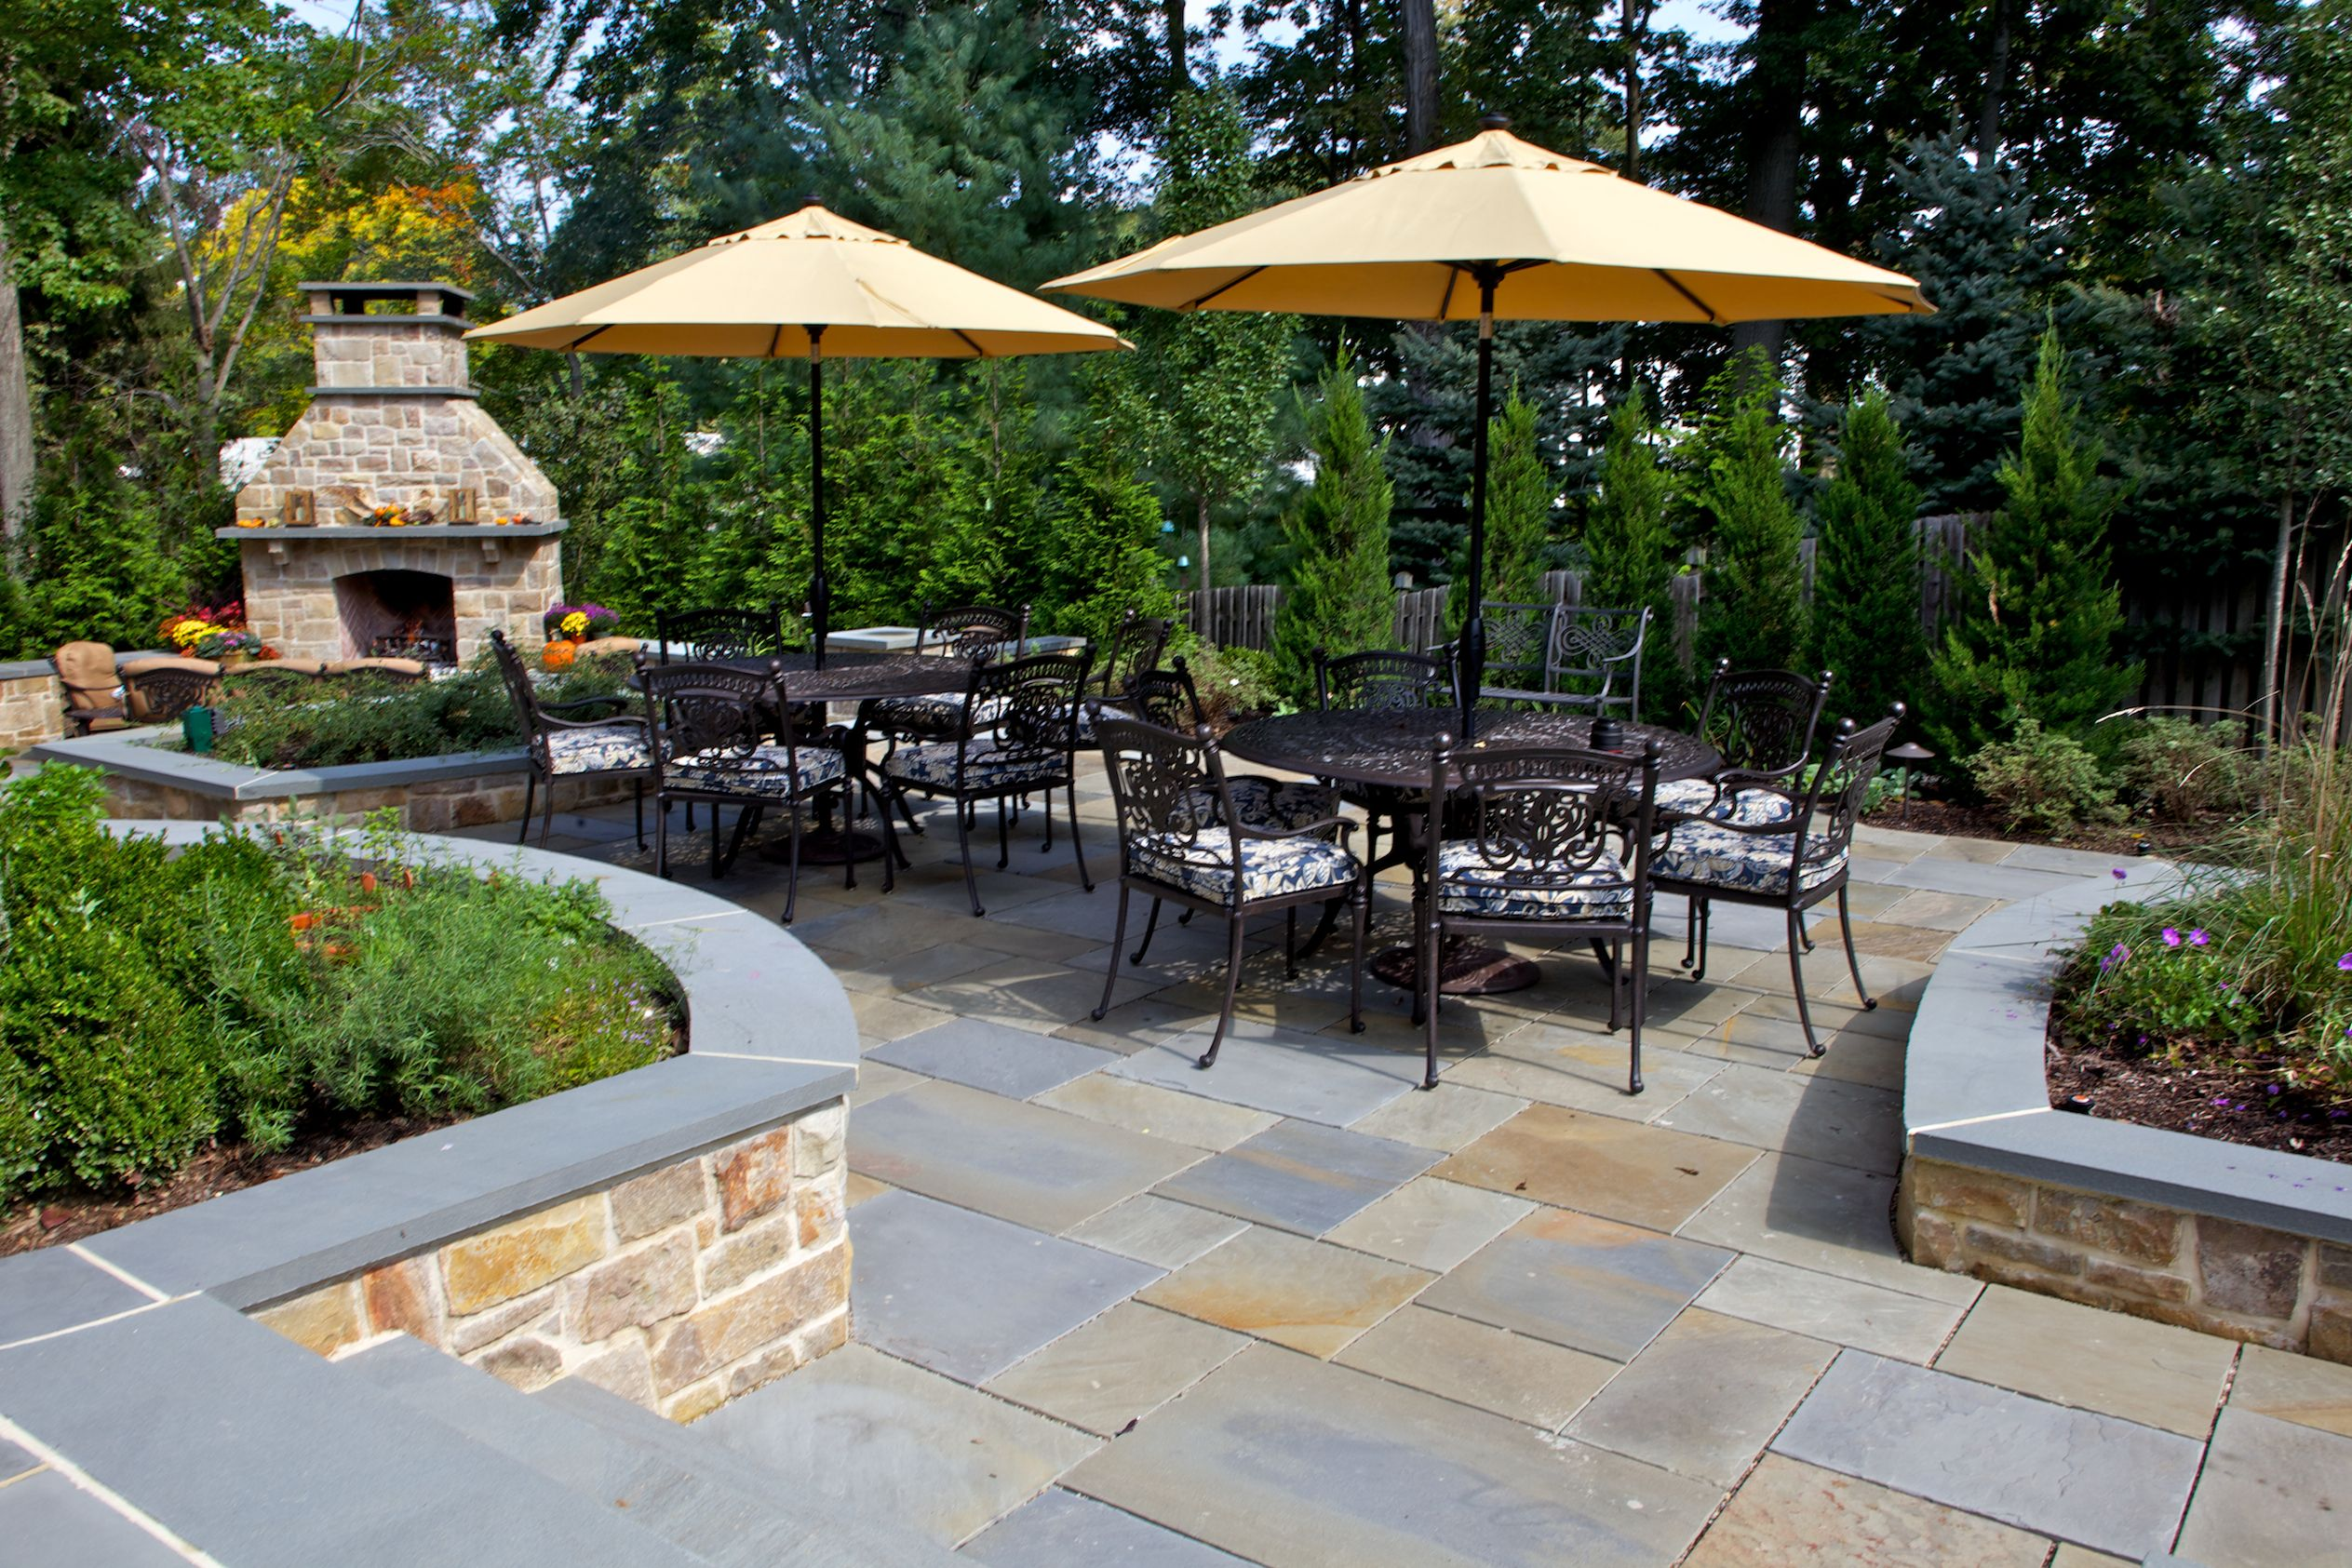 patio designs patio design ideas 2527x1685 patio nj nj on inspiring trends front yard landscaping ideas minimal budget id=83083